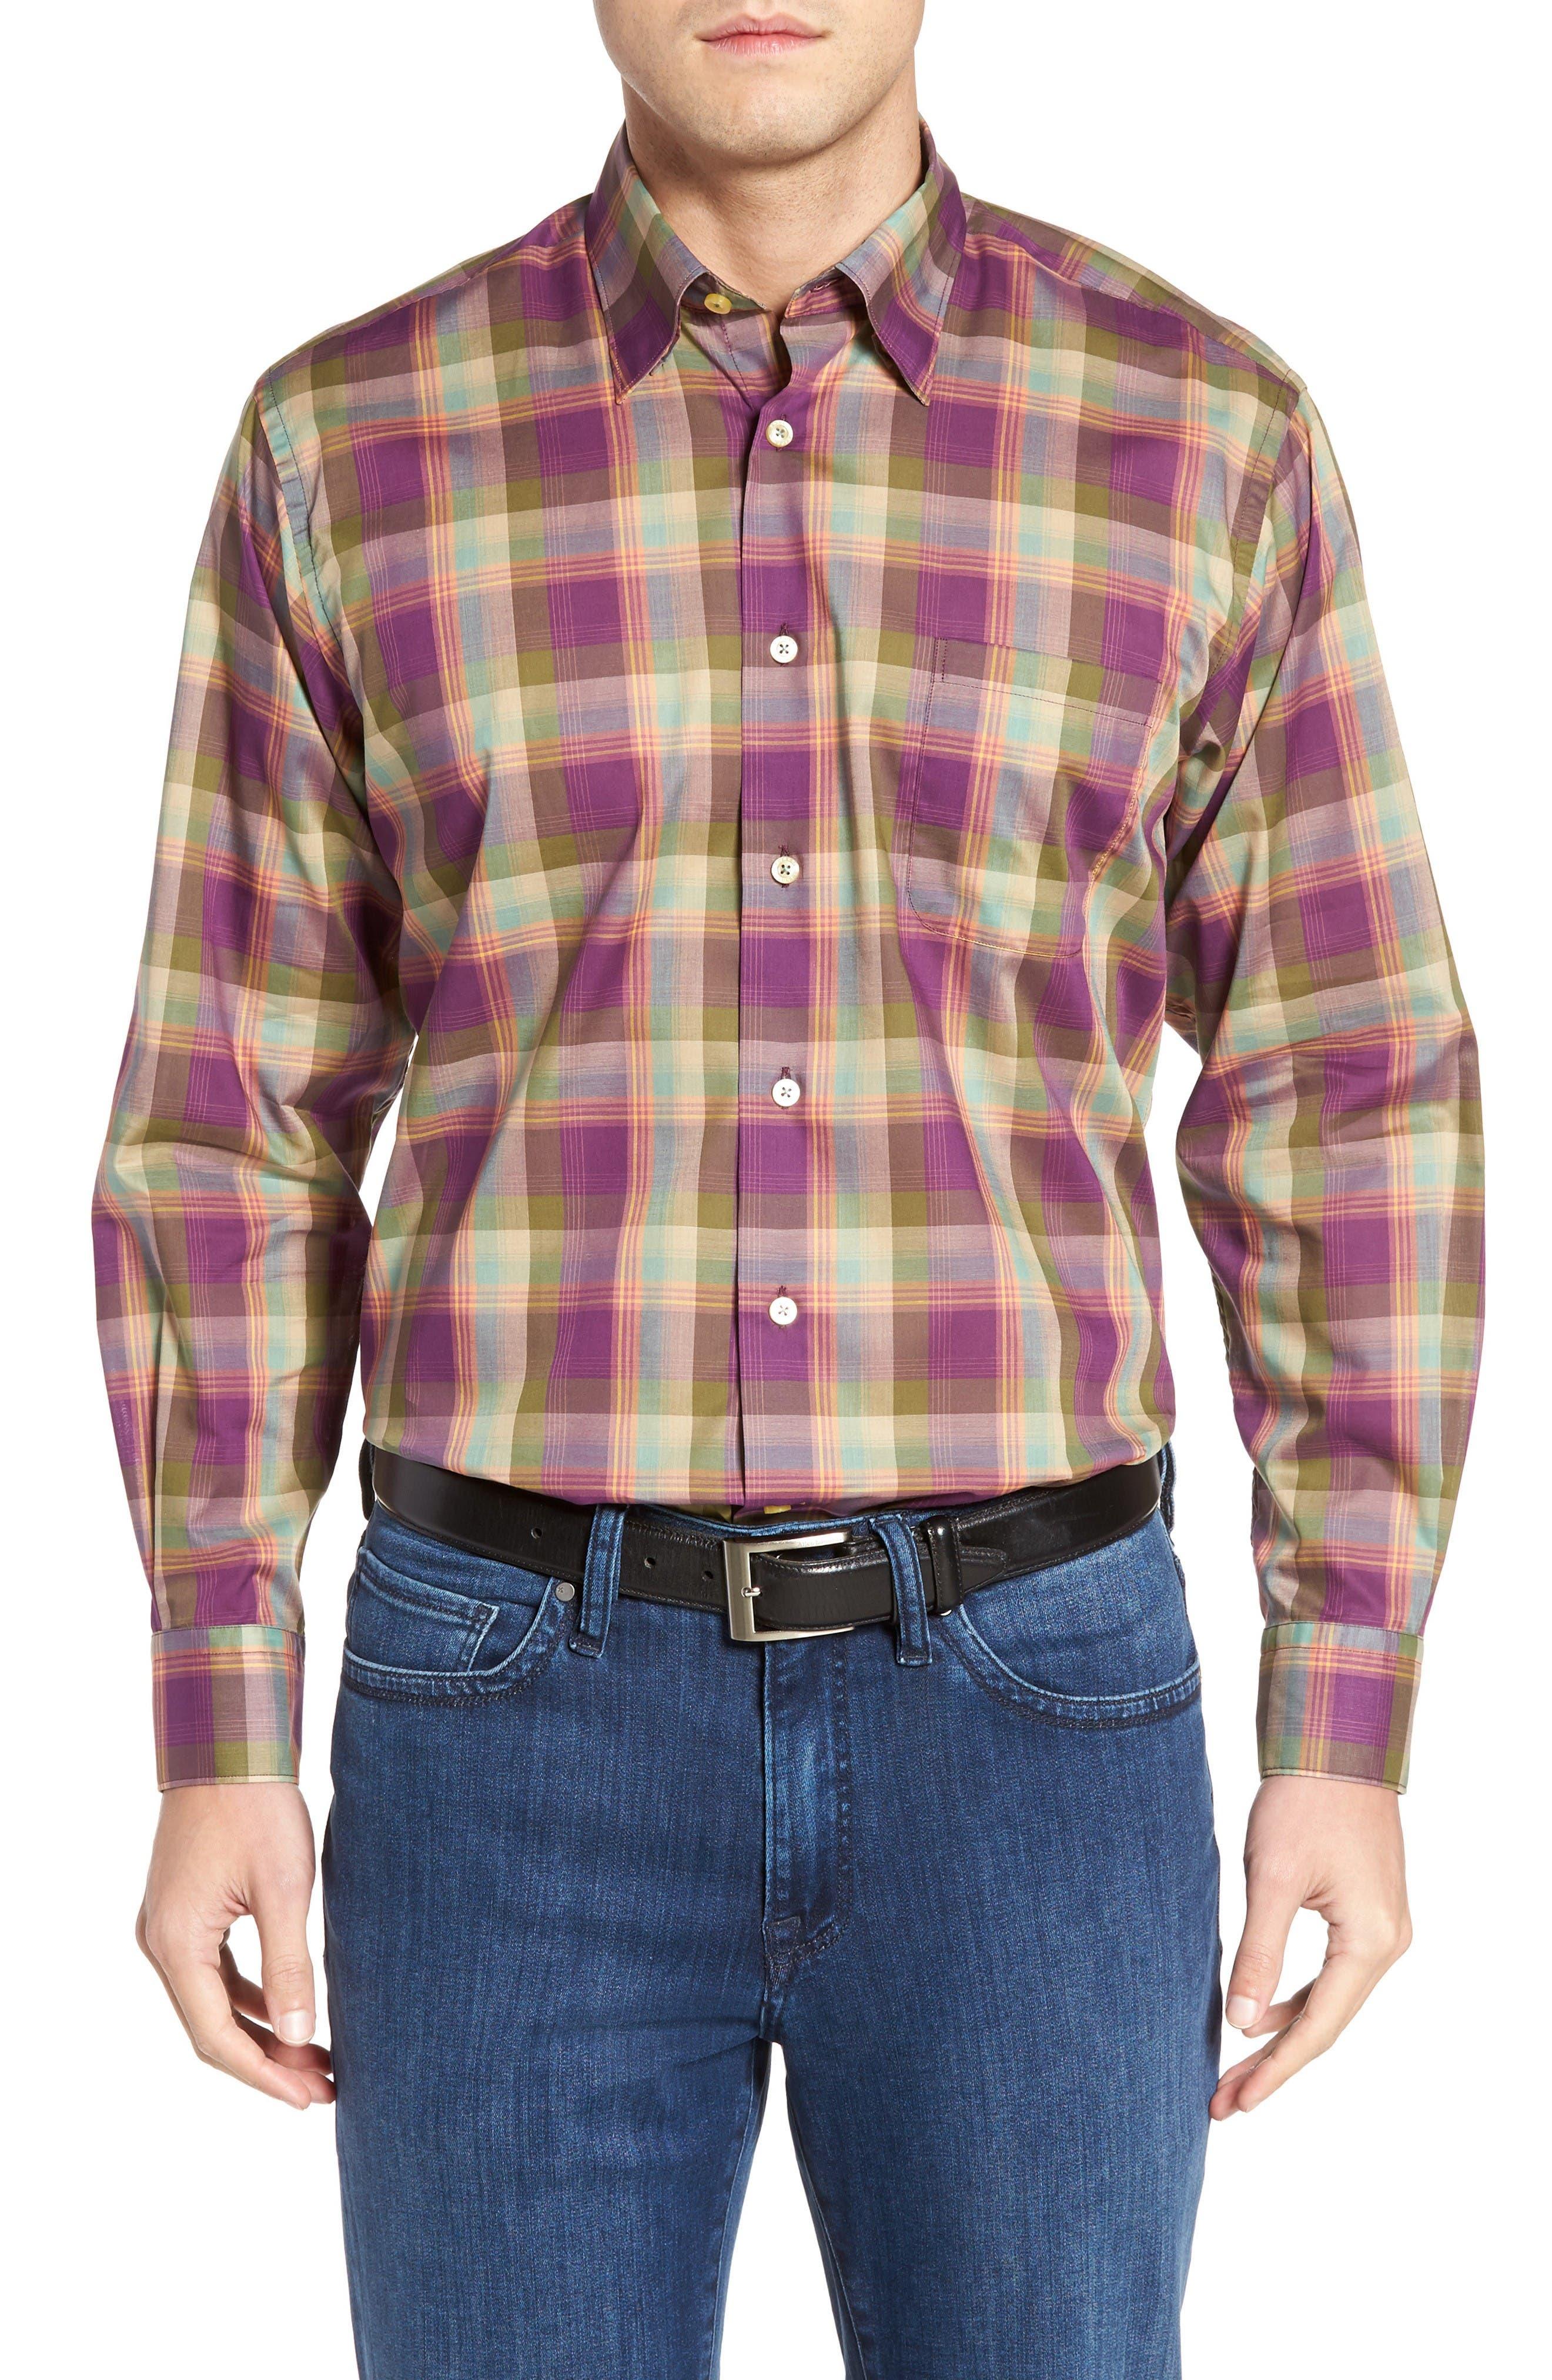 Main Image - Robert Talbott Anderson Classic Fit Plaid Sport Shirt